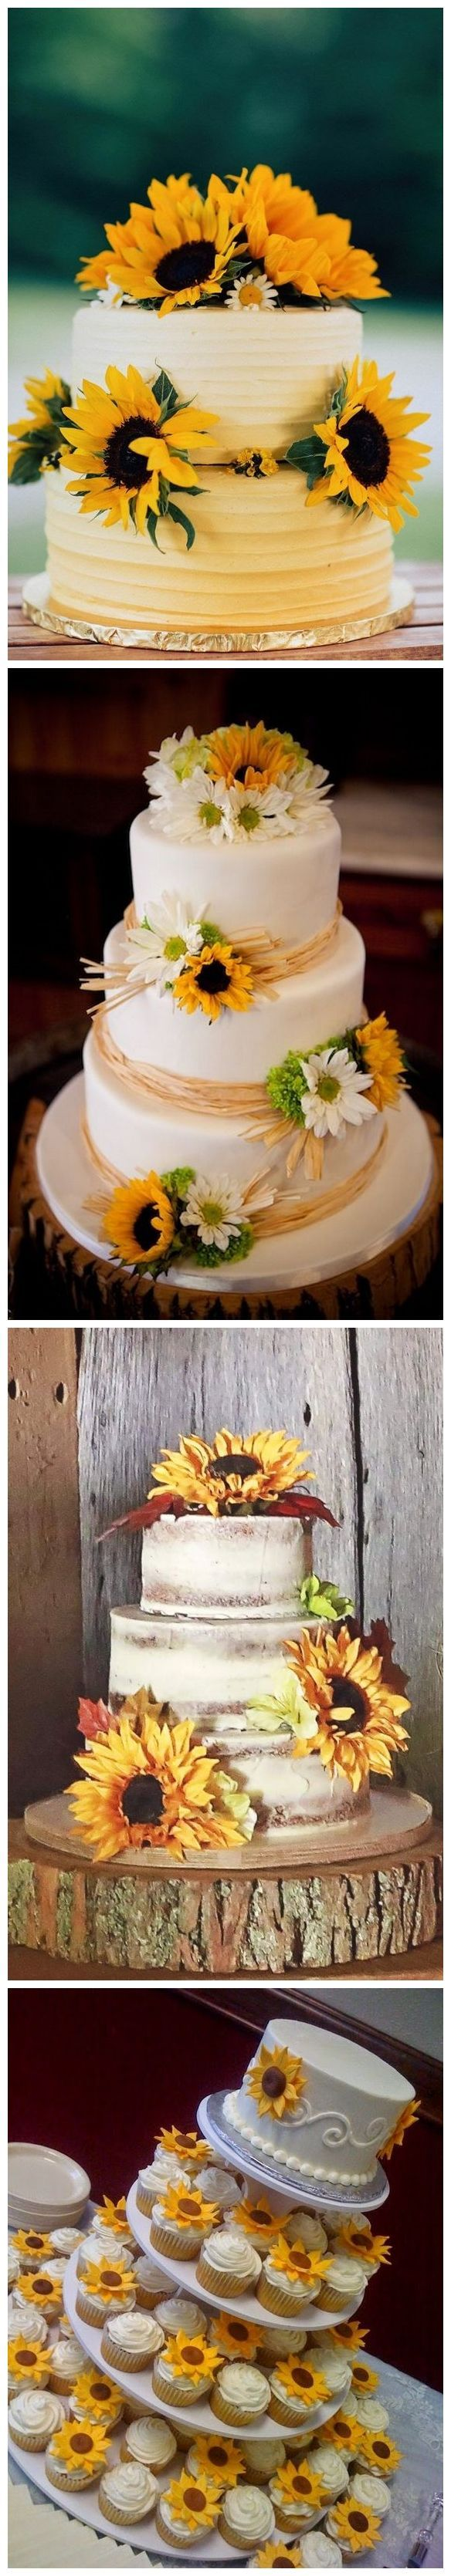 Bold Country Sunflower Wedding ideas /   http://www.himisspuff.com/country-sunflower-wedding-ideas/